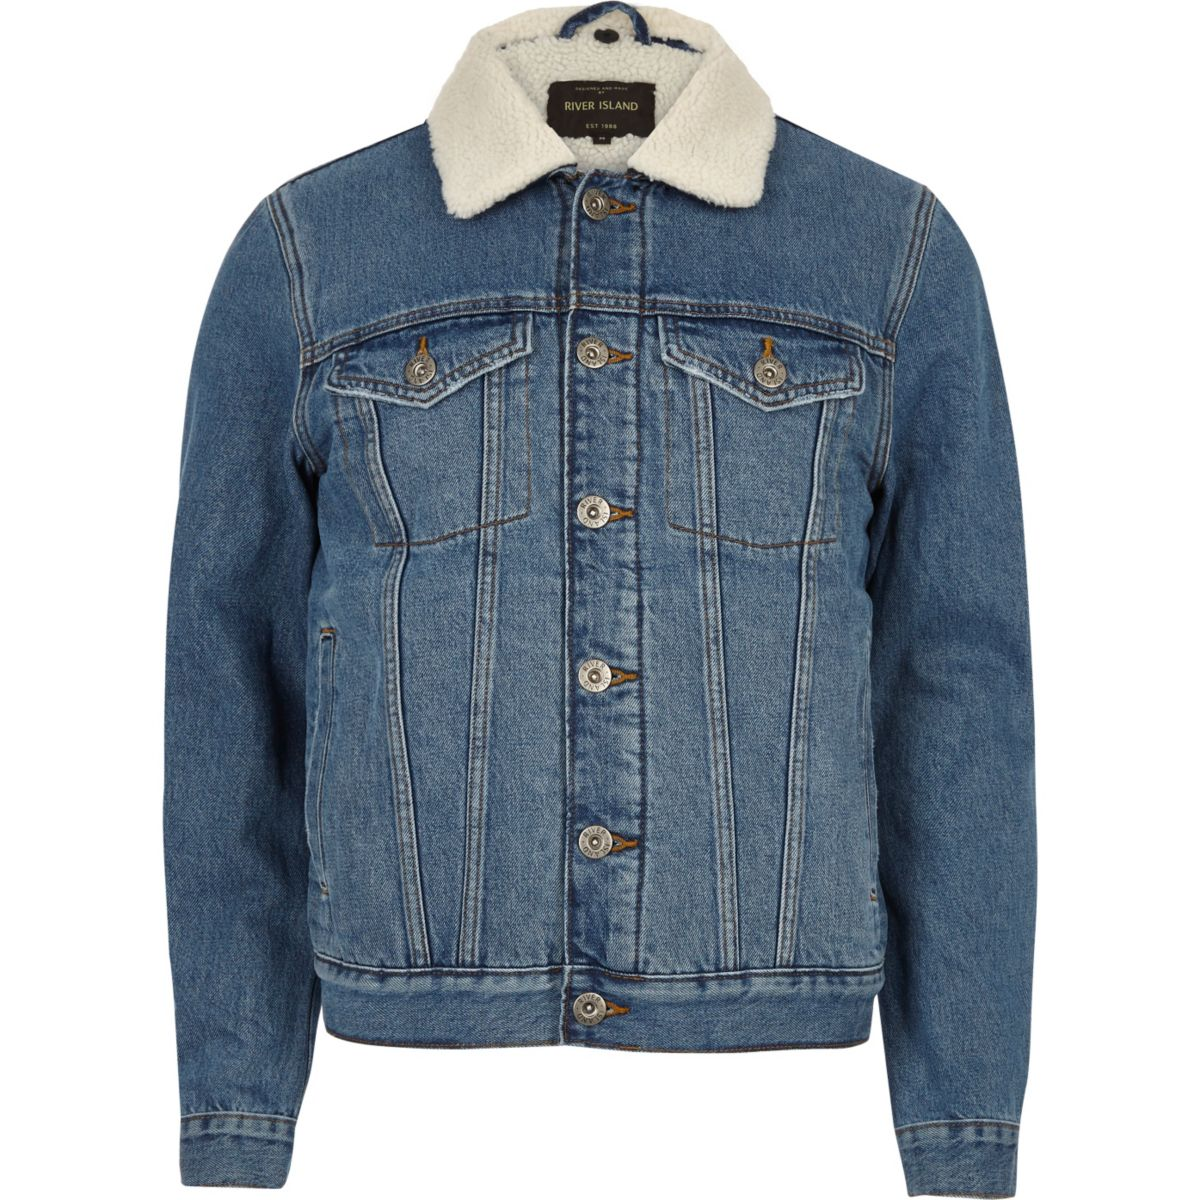 Blue wash fleece lined denim jacket